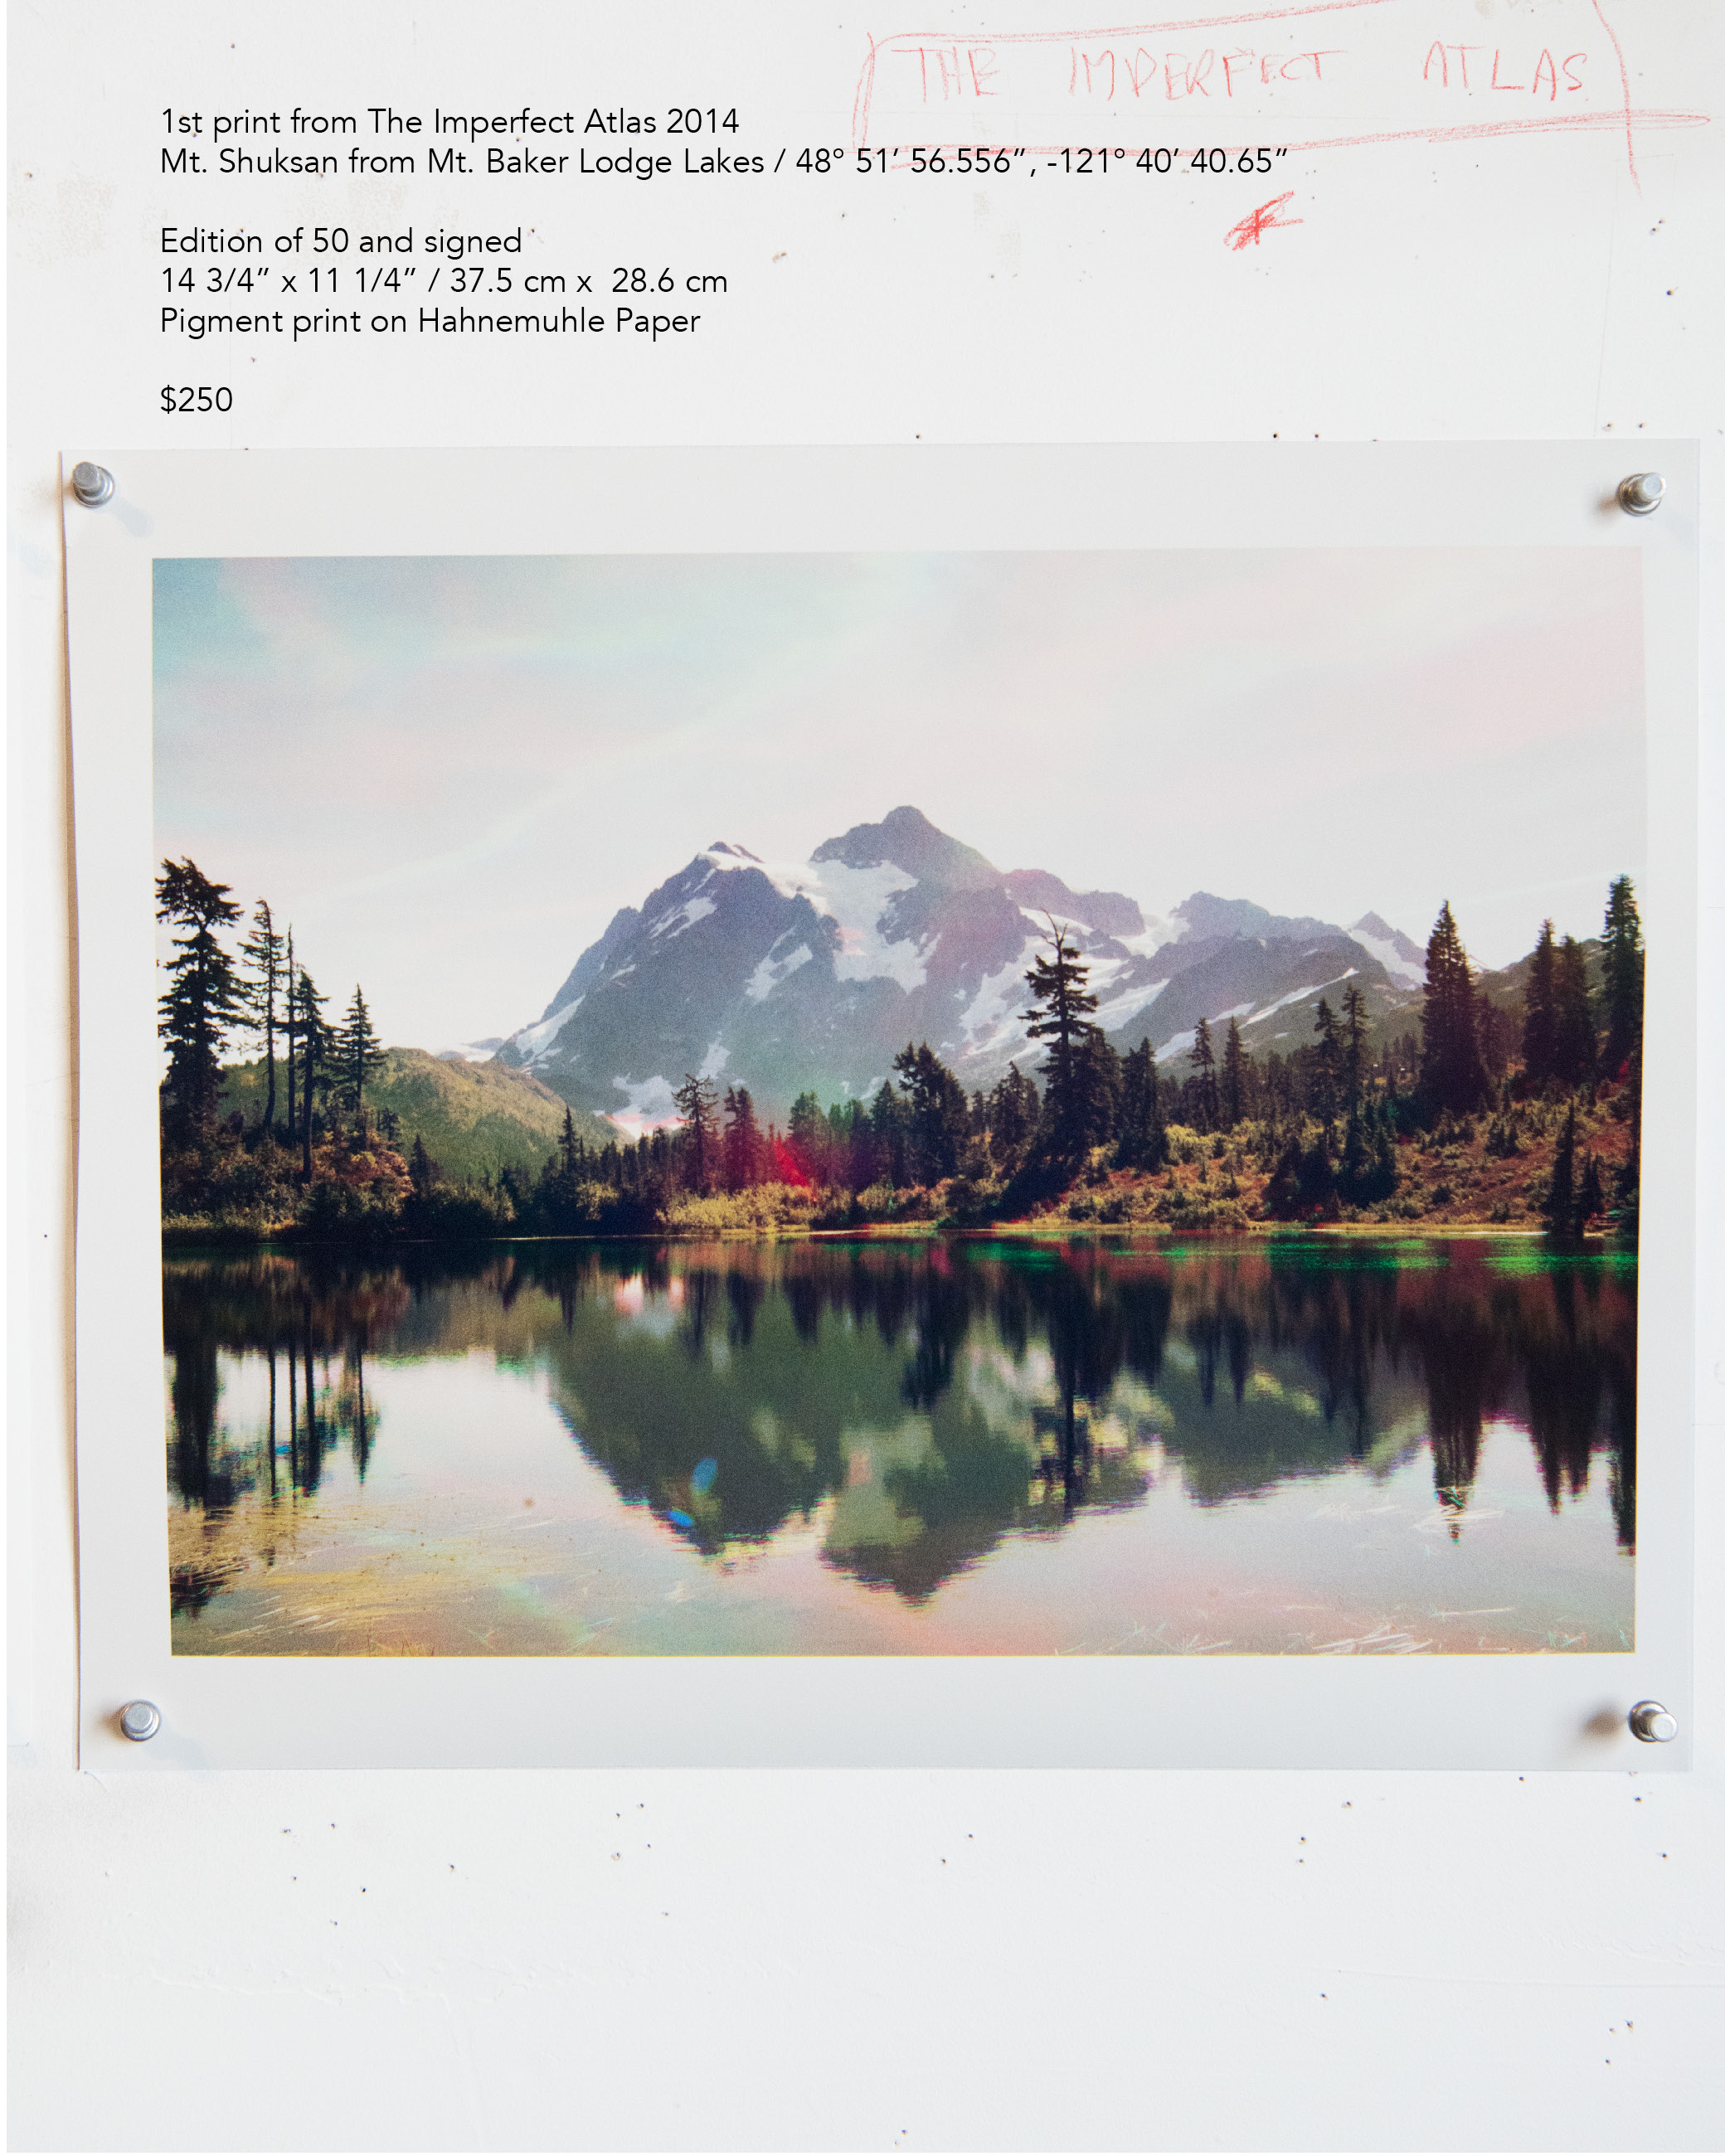 pf1612_editionprint1